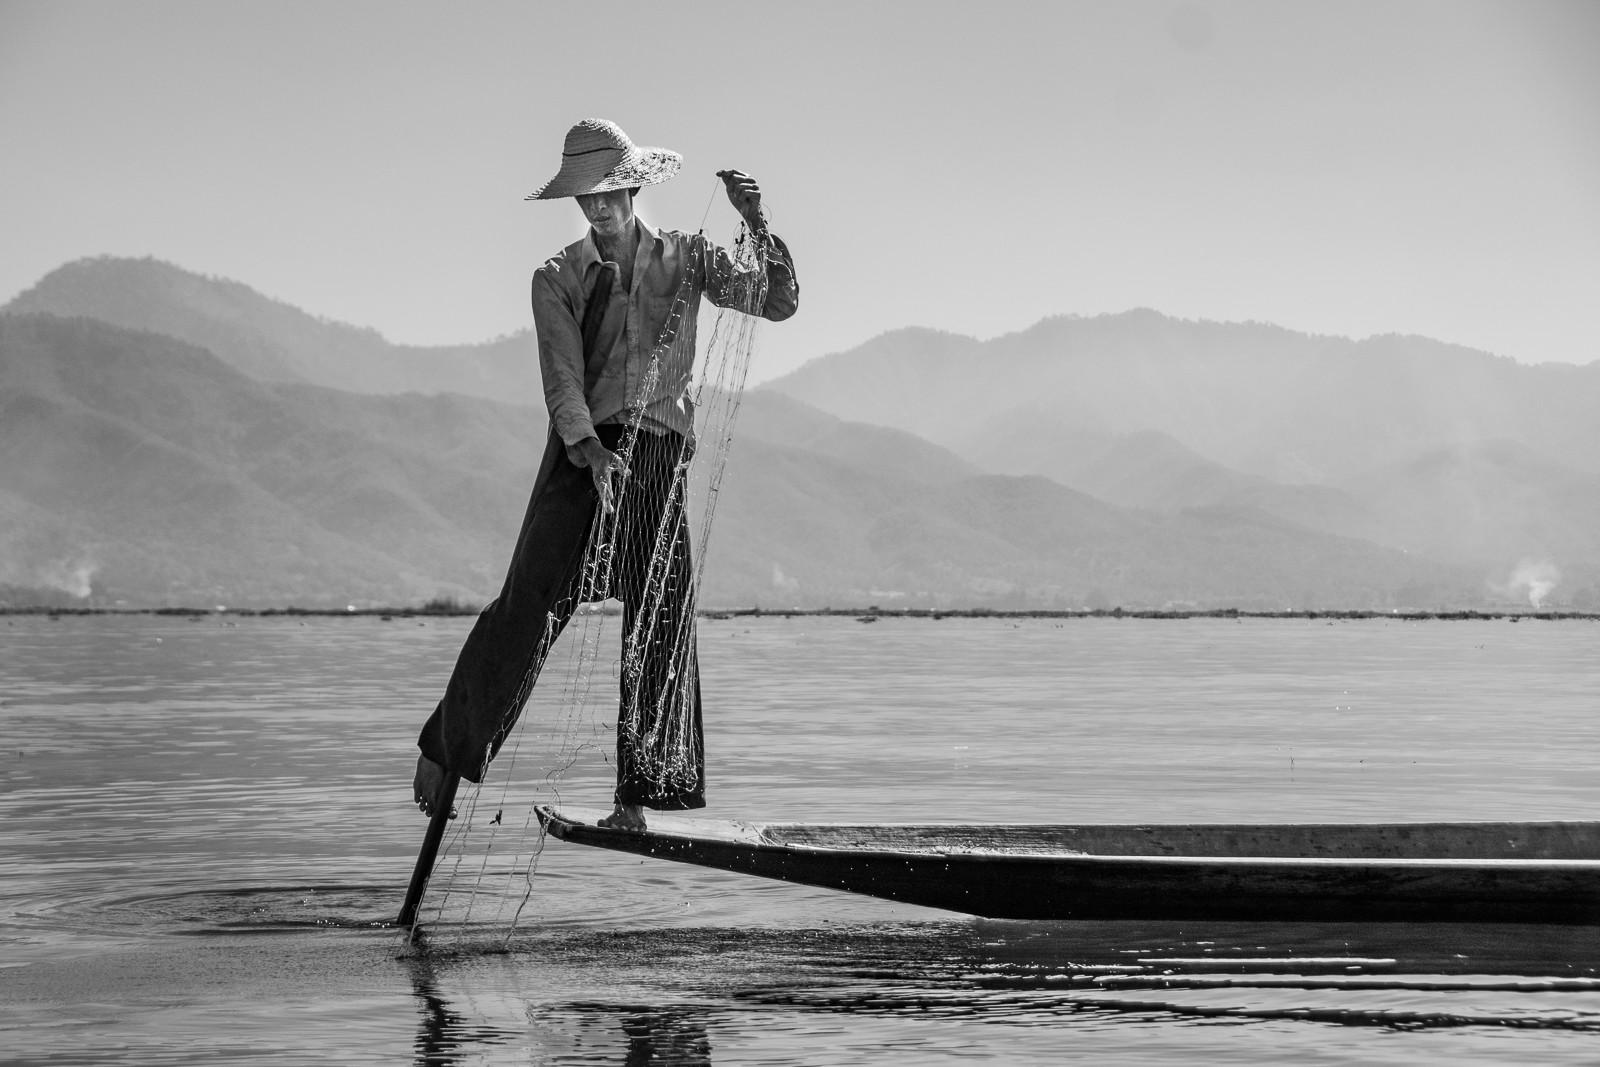 MONO - Inle Fisherman by Elsie Fairley (9 marks)